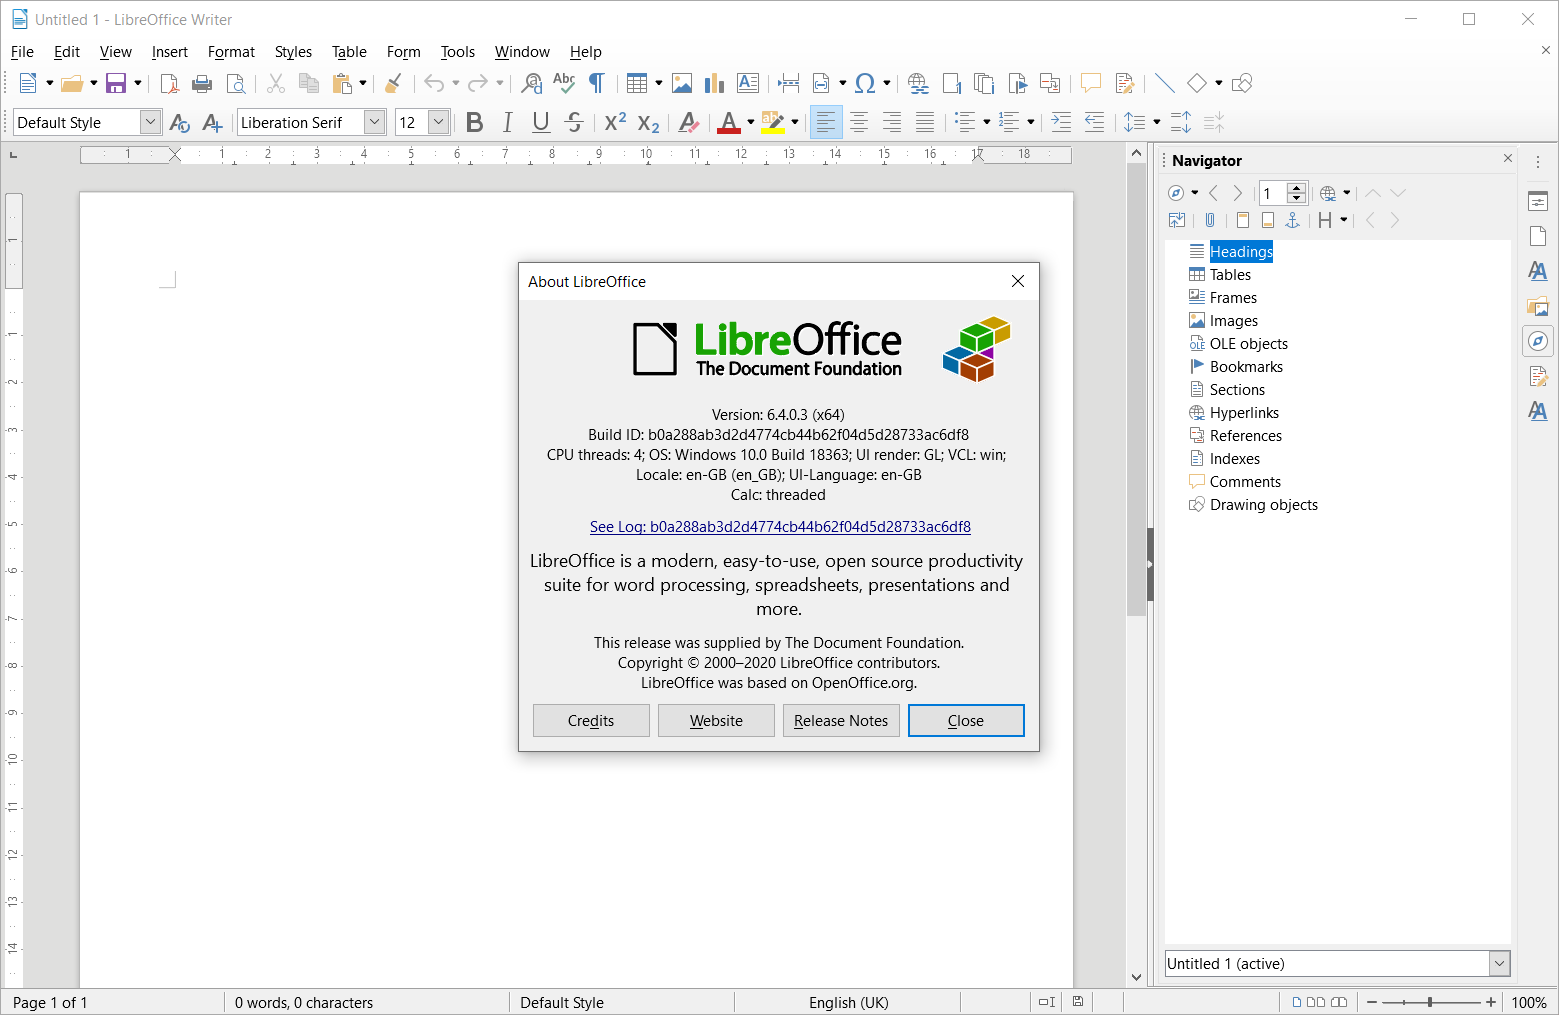 LibreOffice Writer 6.4